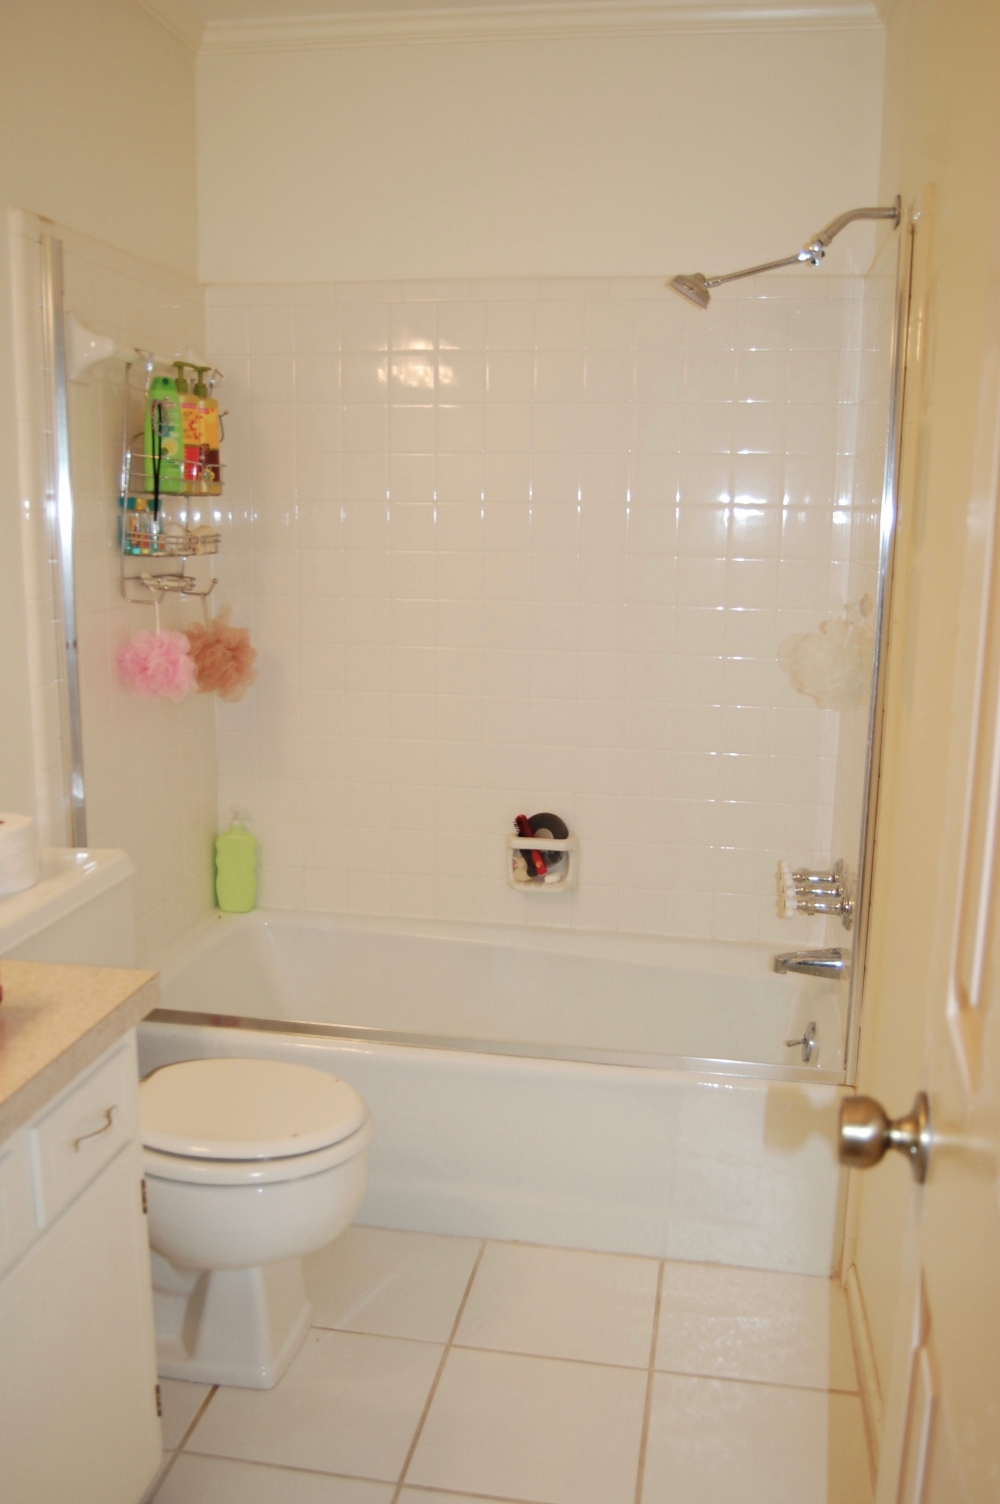 Mini Bathroom Remodel Removing The Shower Doors